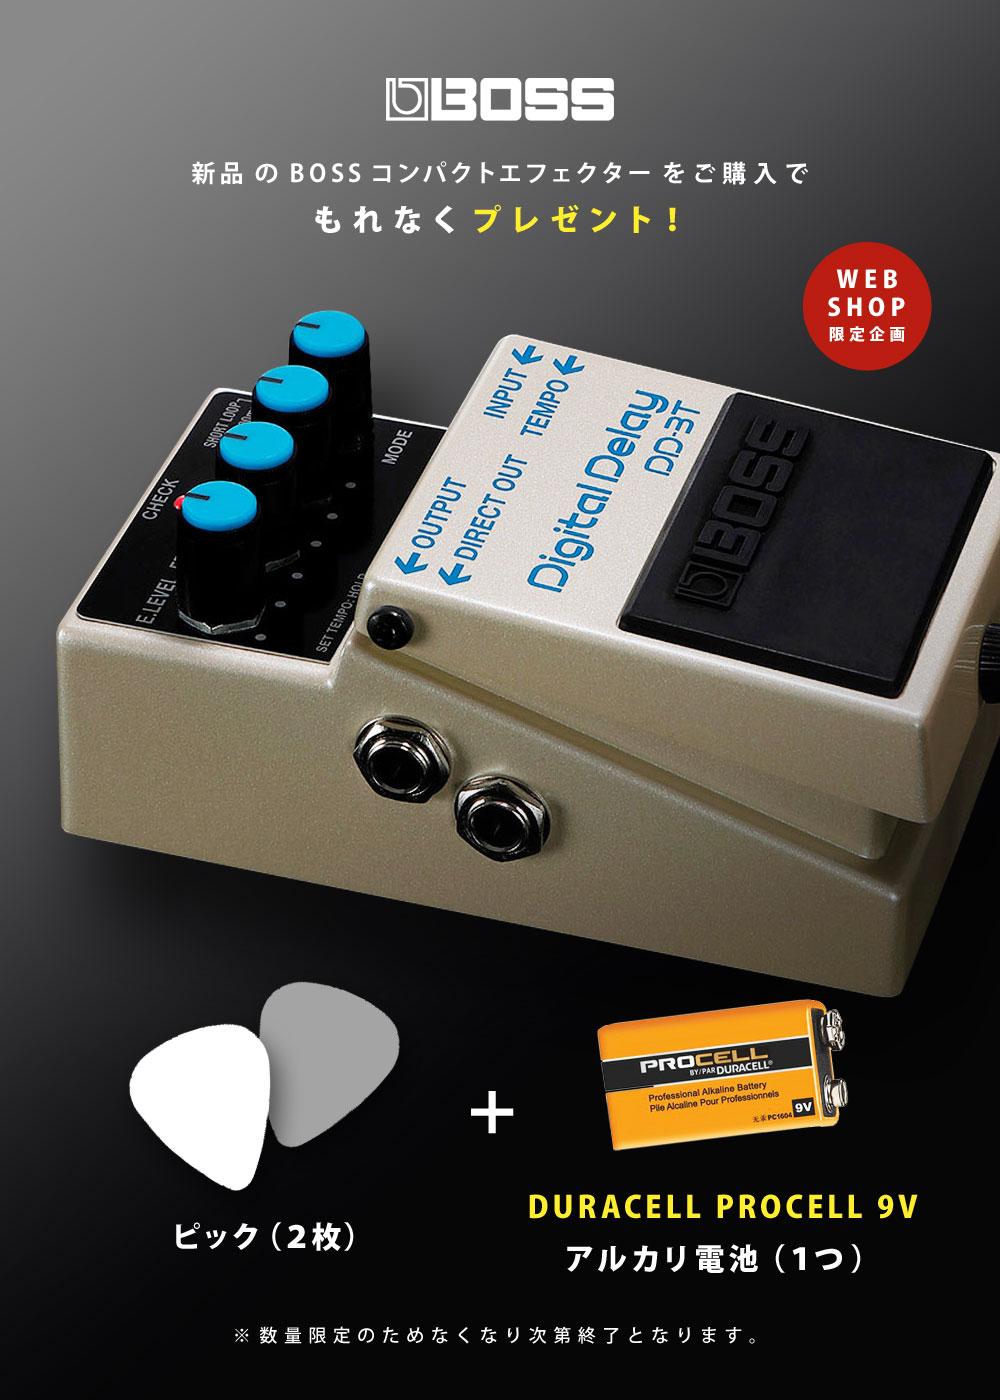 BOSS コンパクトエフェクターをご購入で、アクセサリープレゼント!【イシバシ楽器】